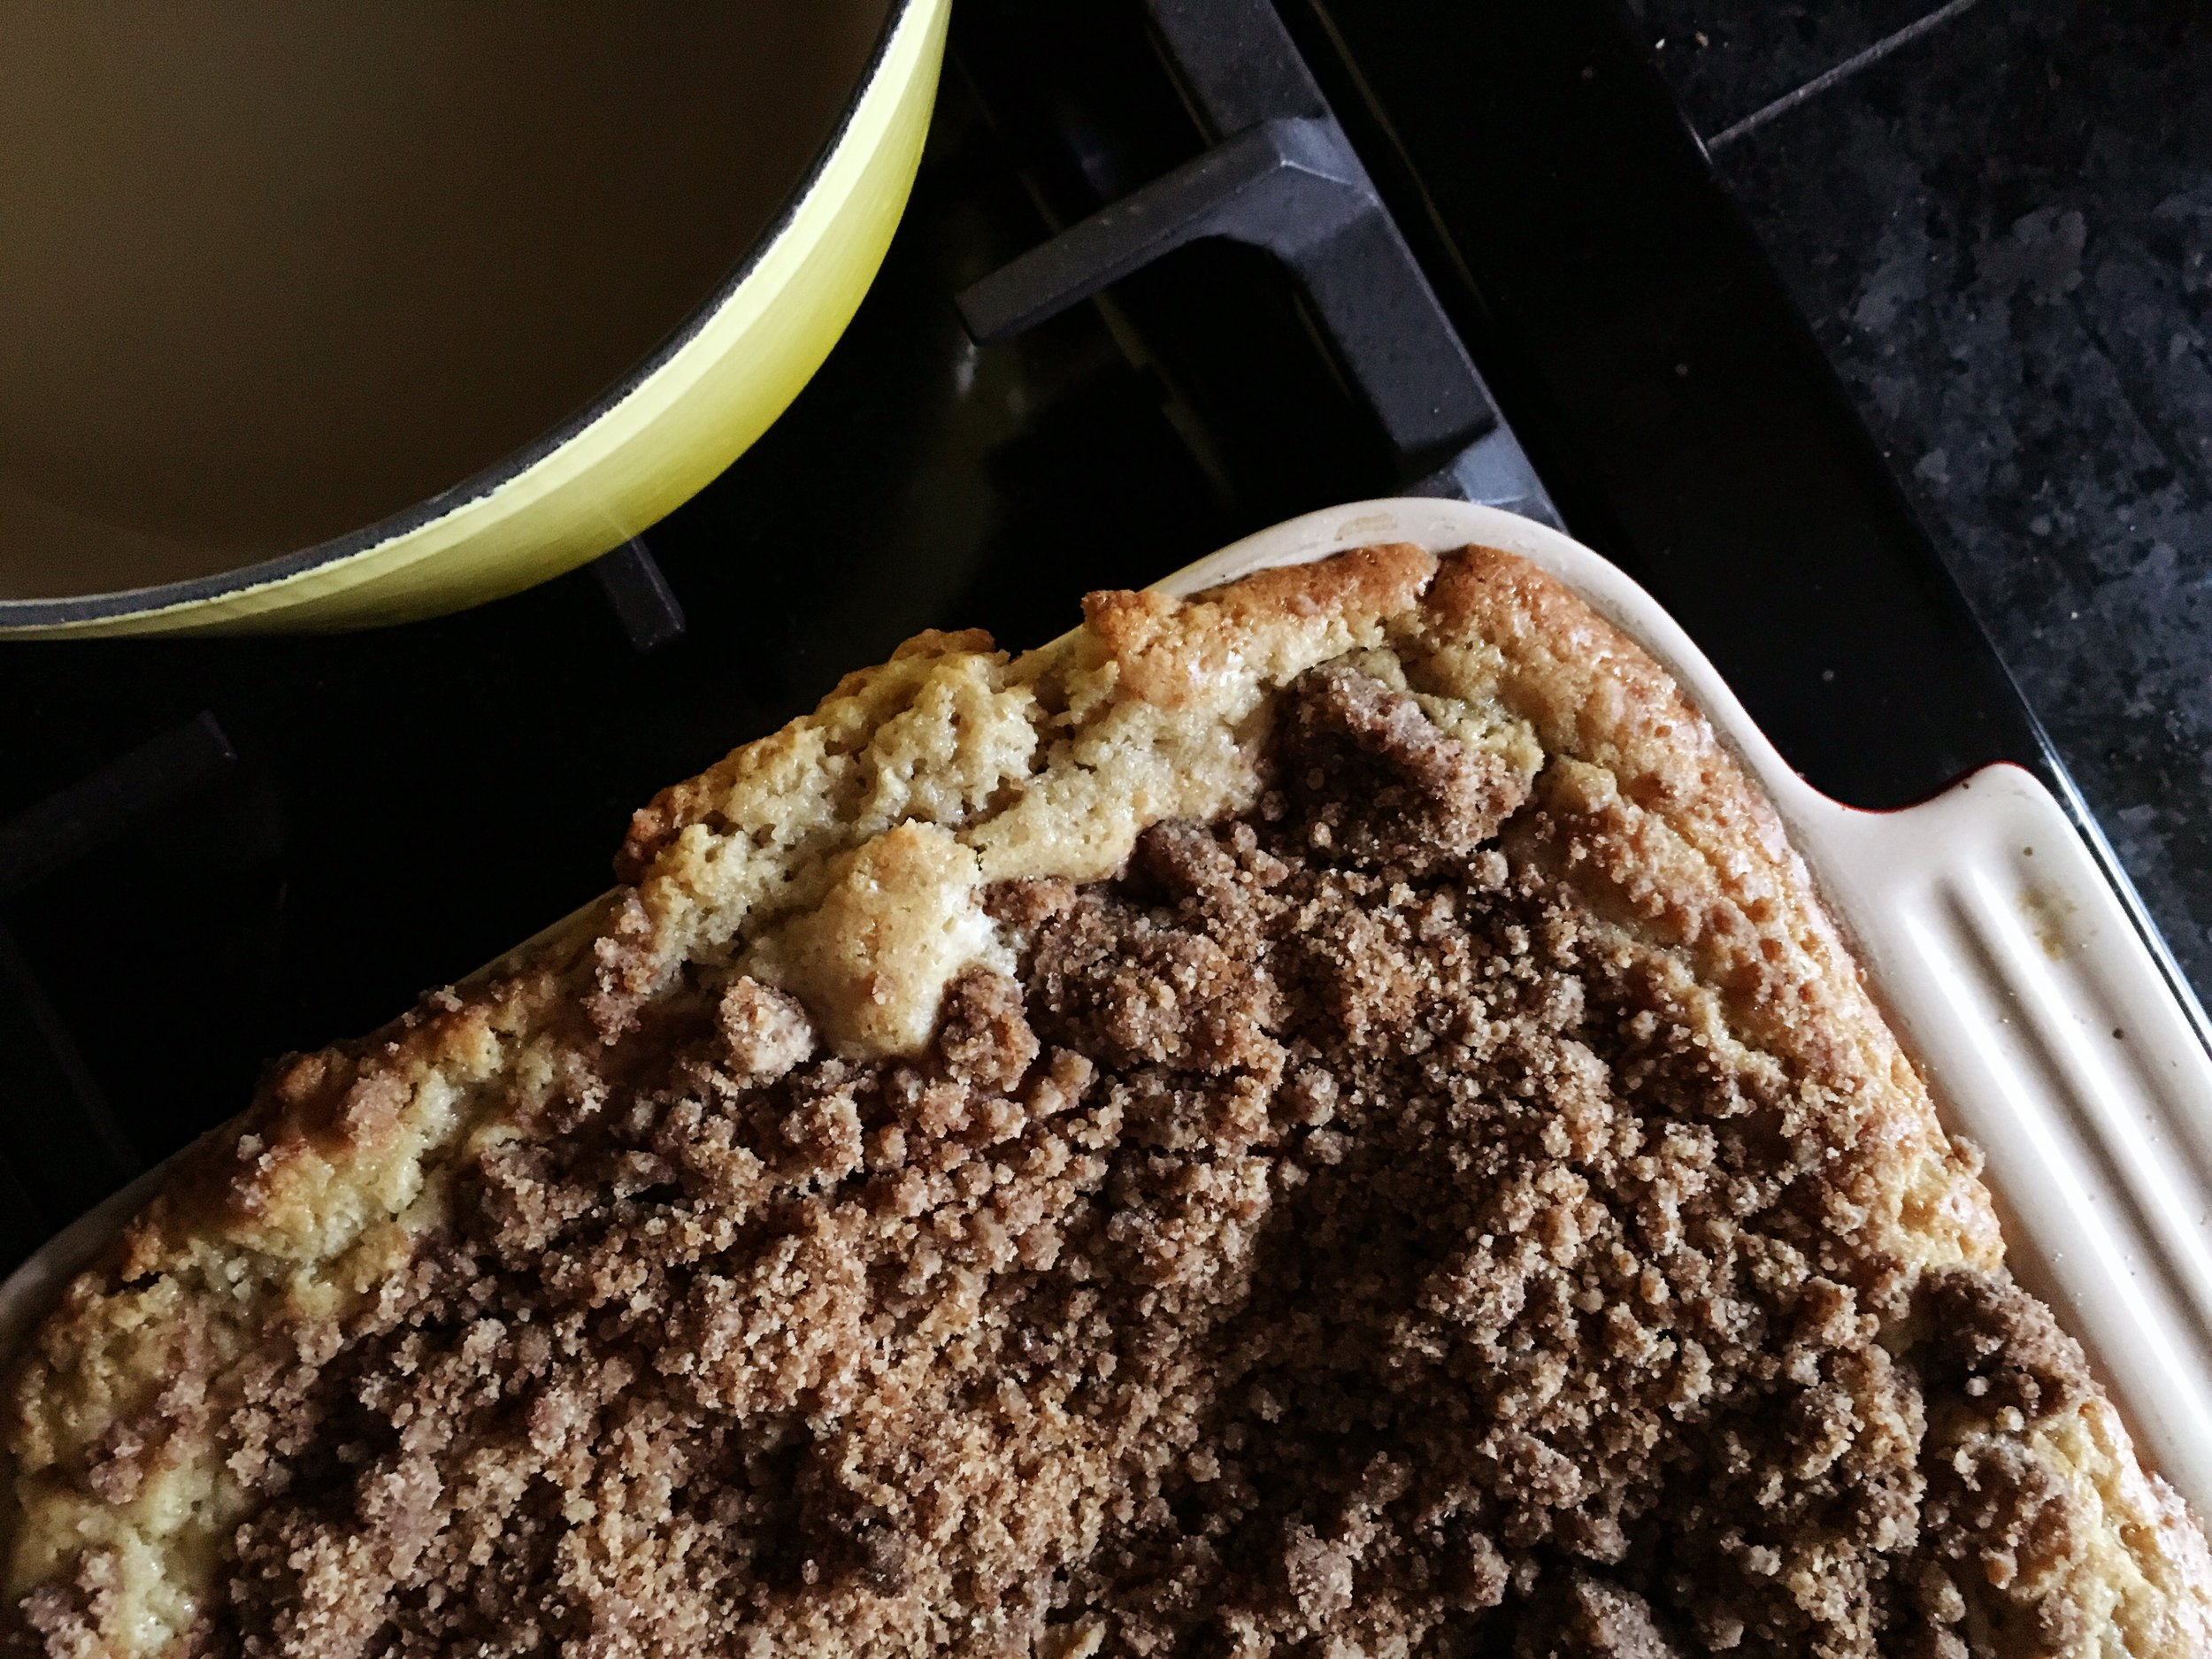 Coffee cake, crumb topped